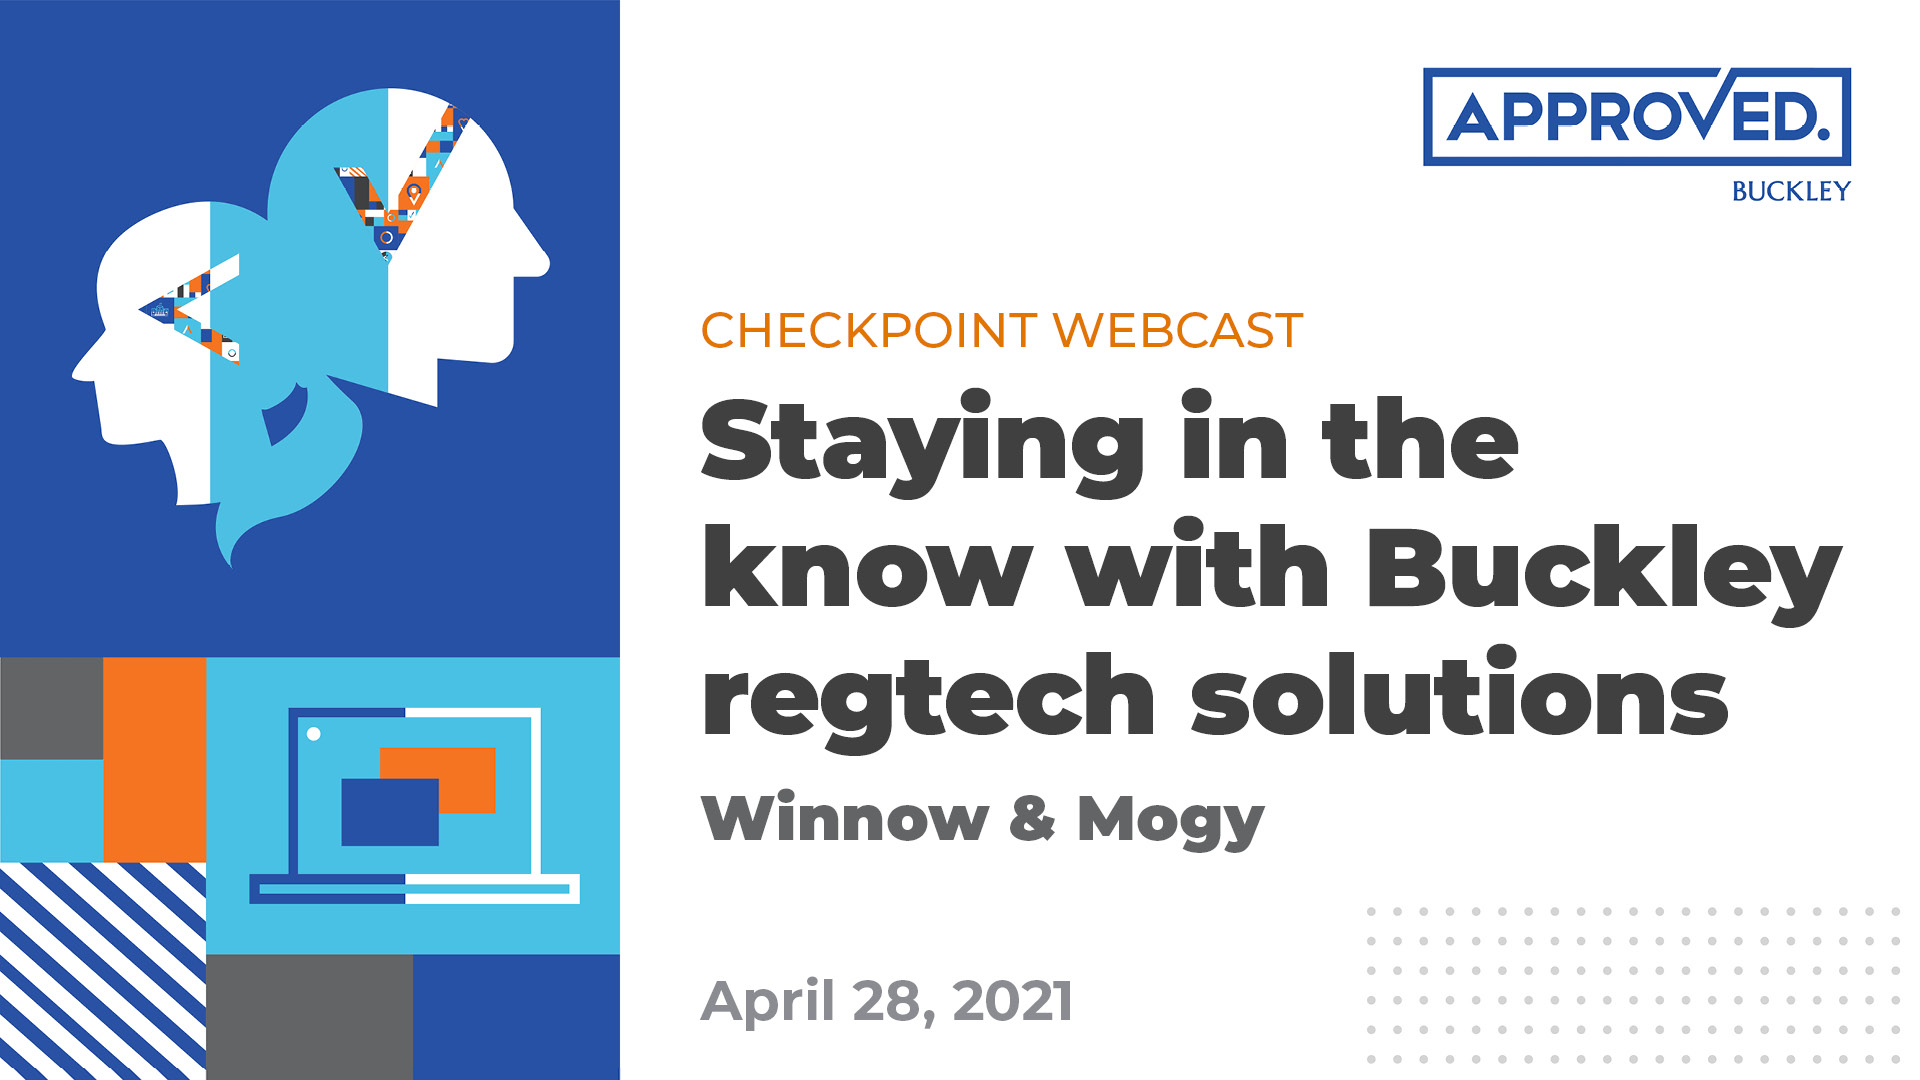 Buckley Regtech Solutions